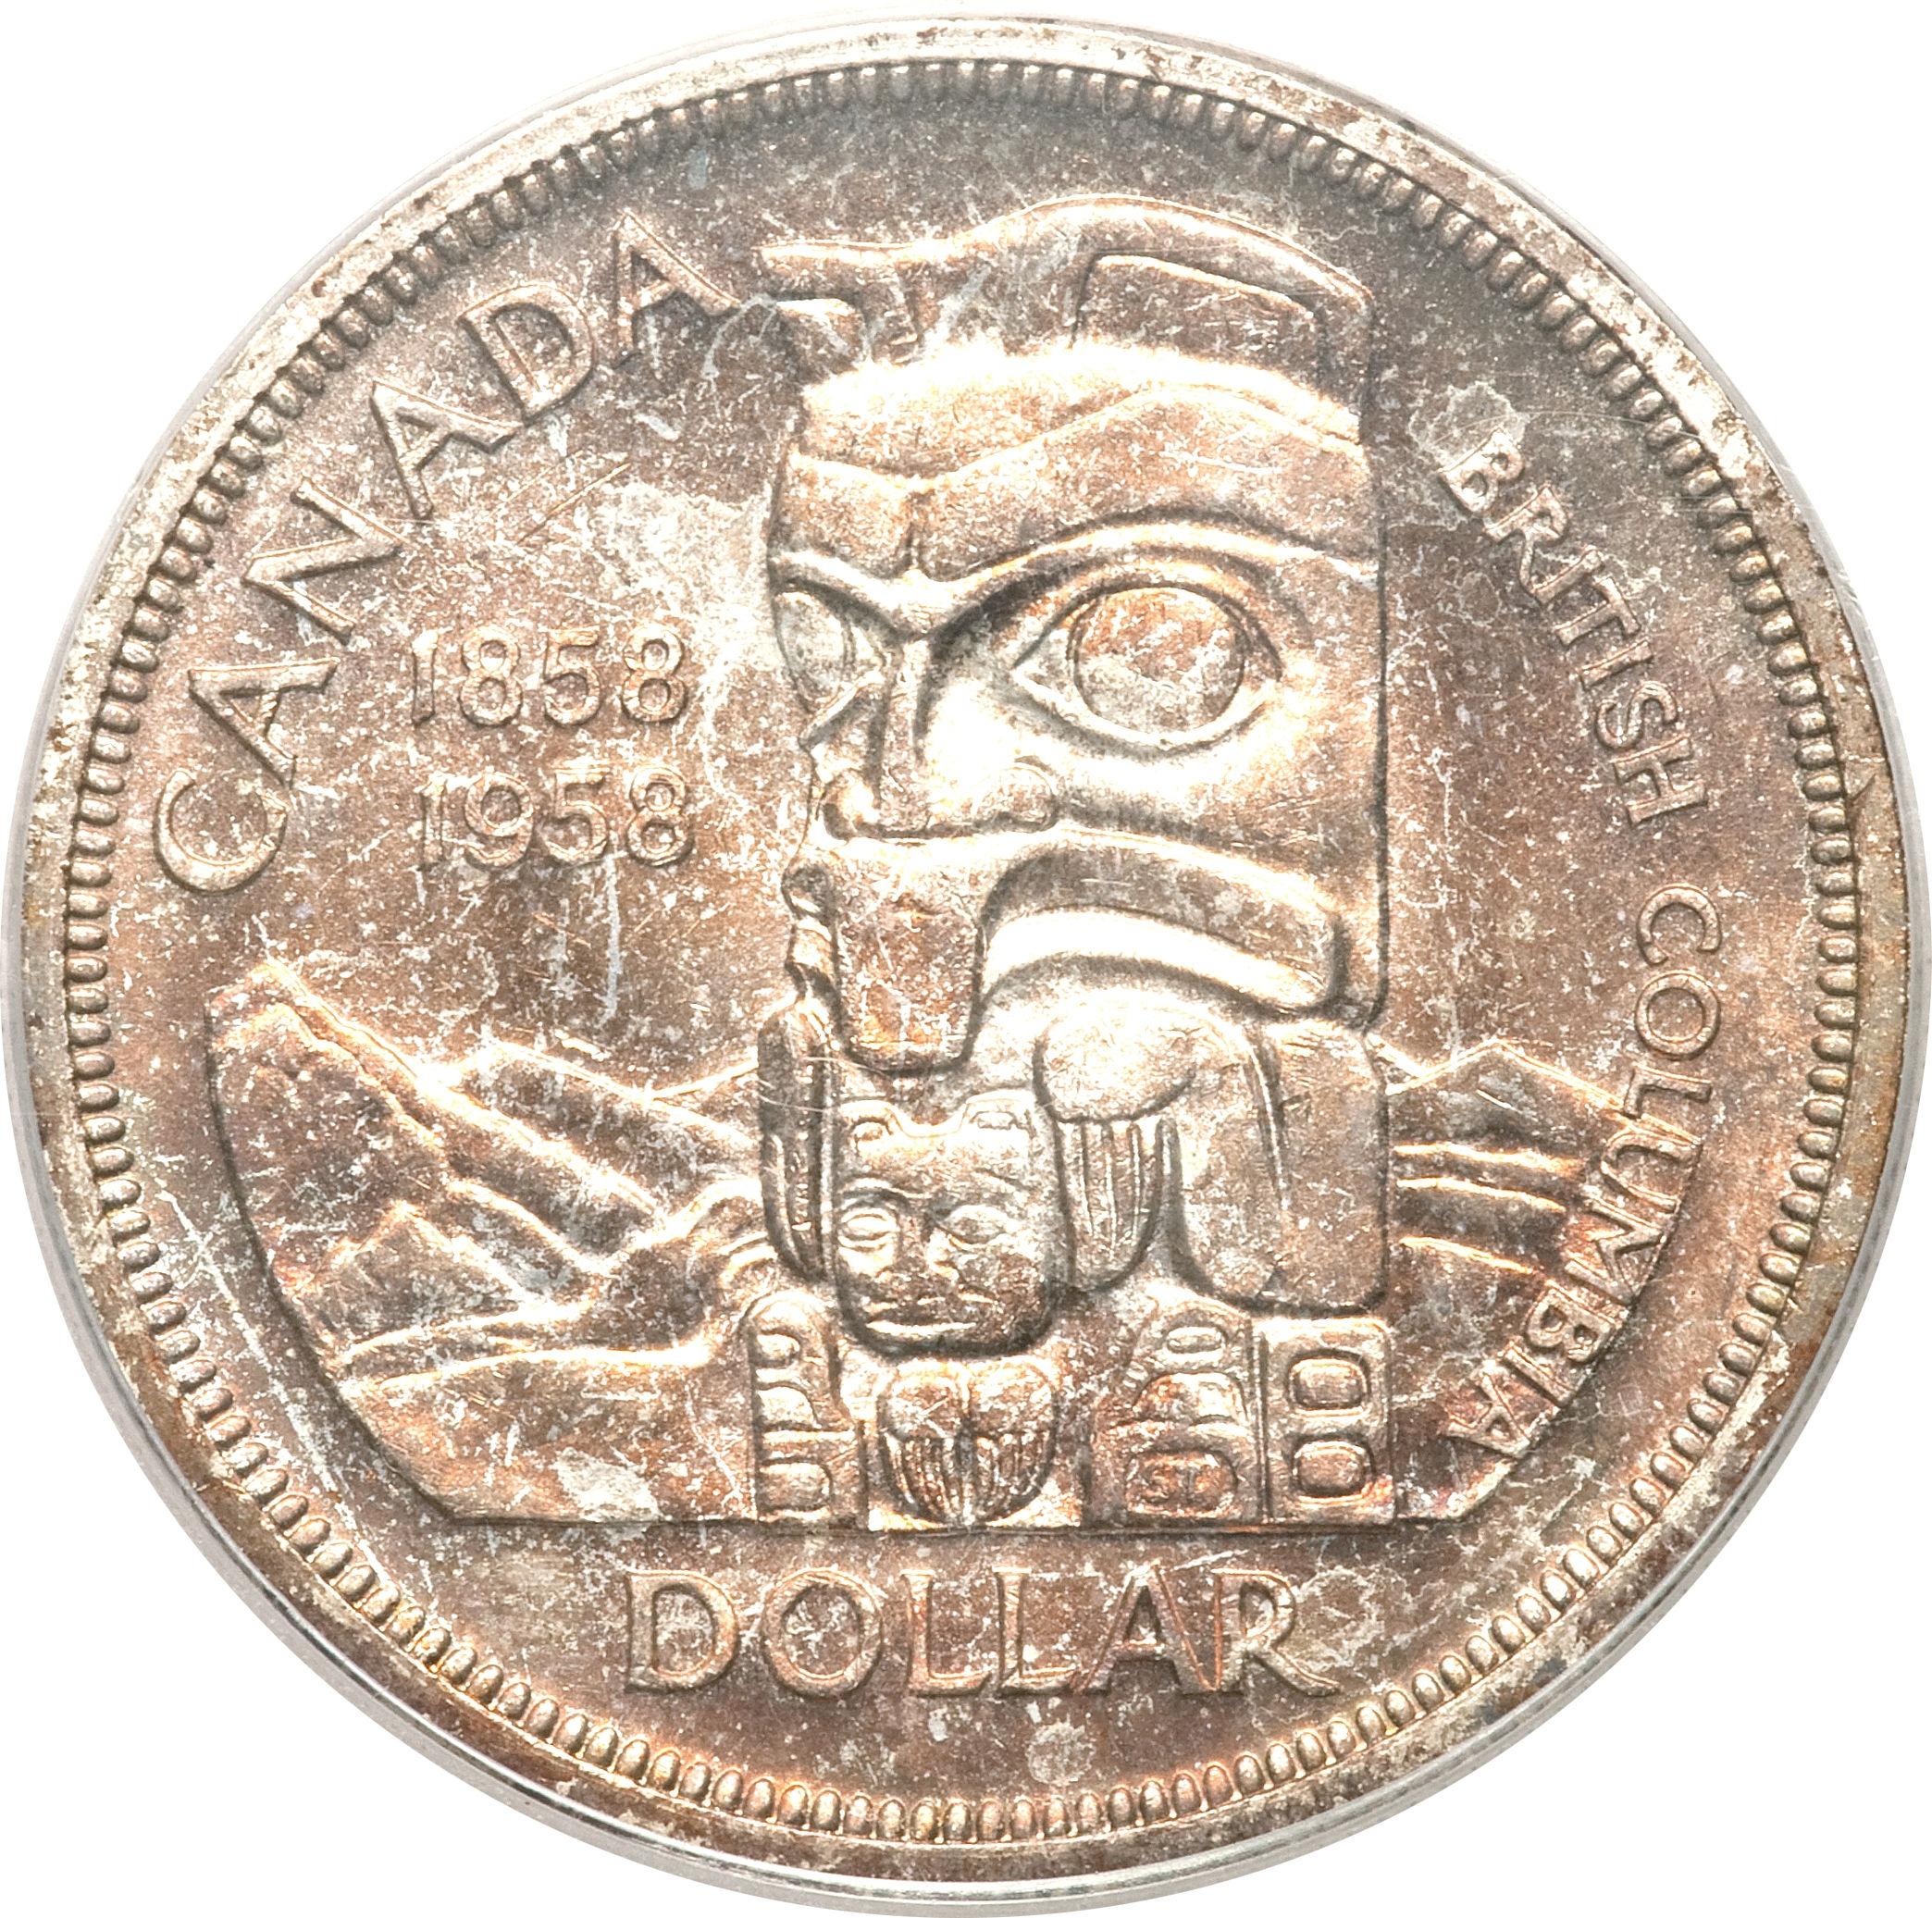 1 Dollar - Elizabeth II (British Columbia) - Canada – Numista